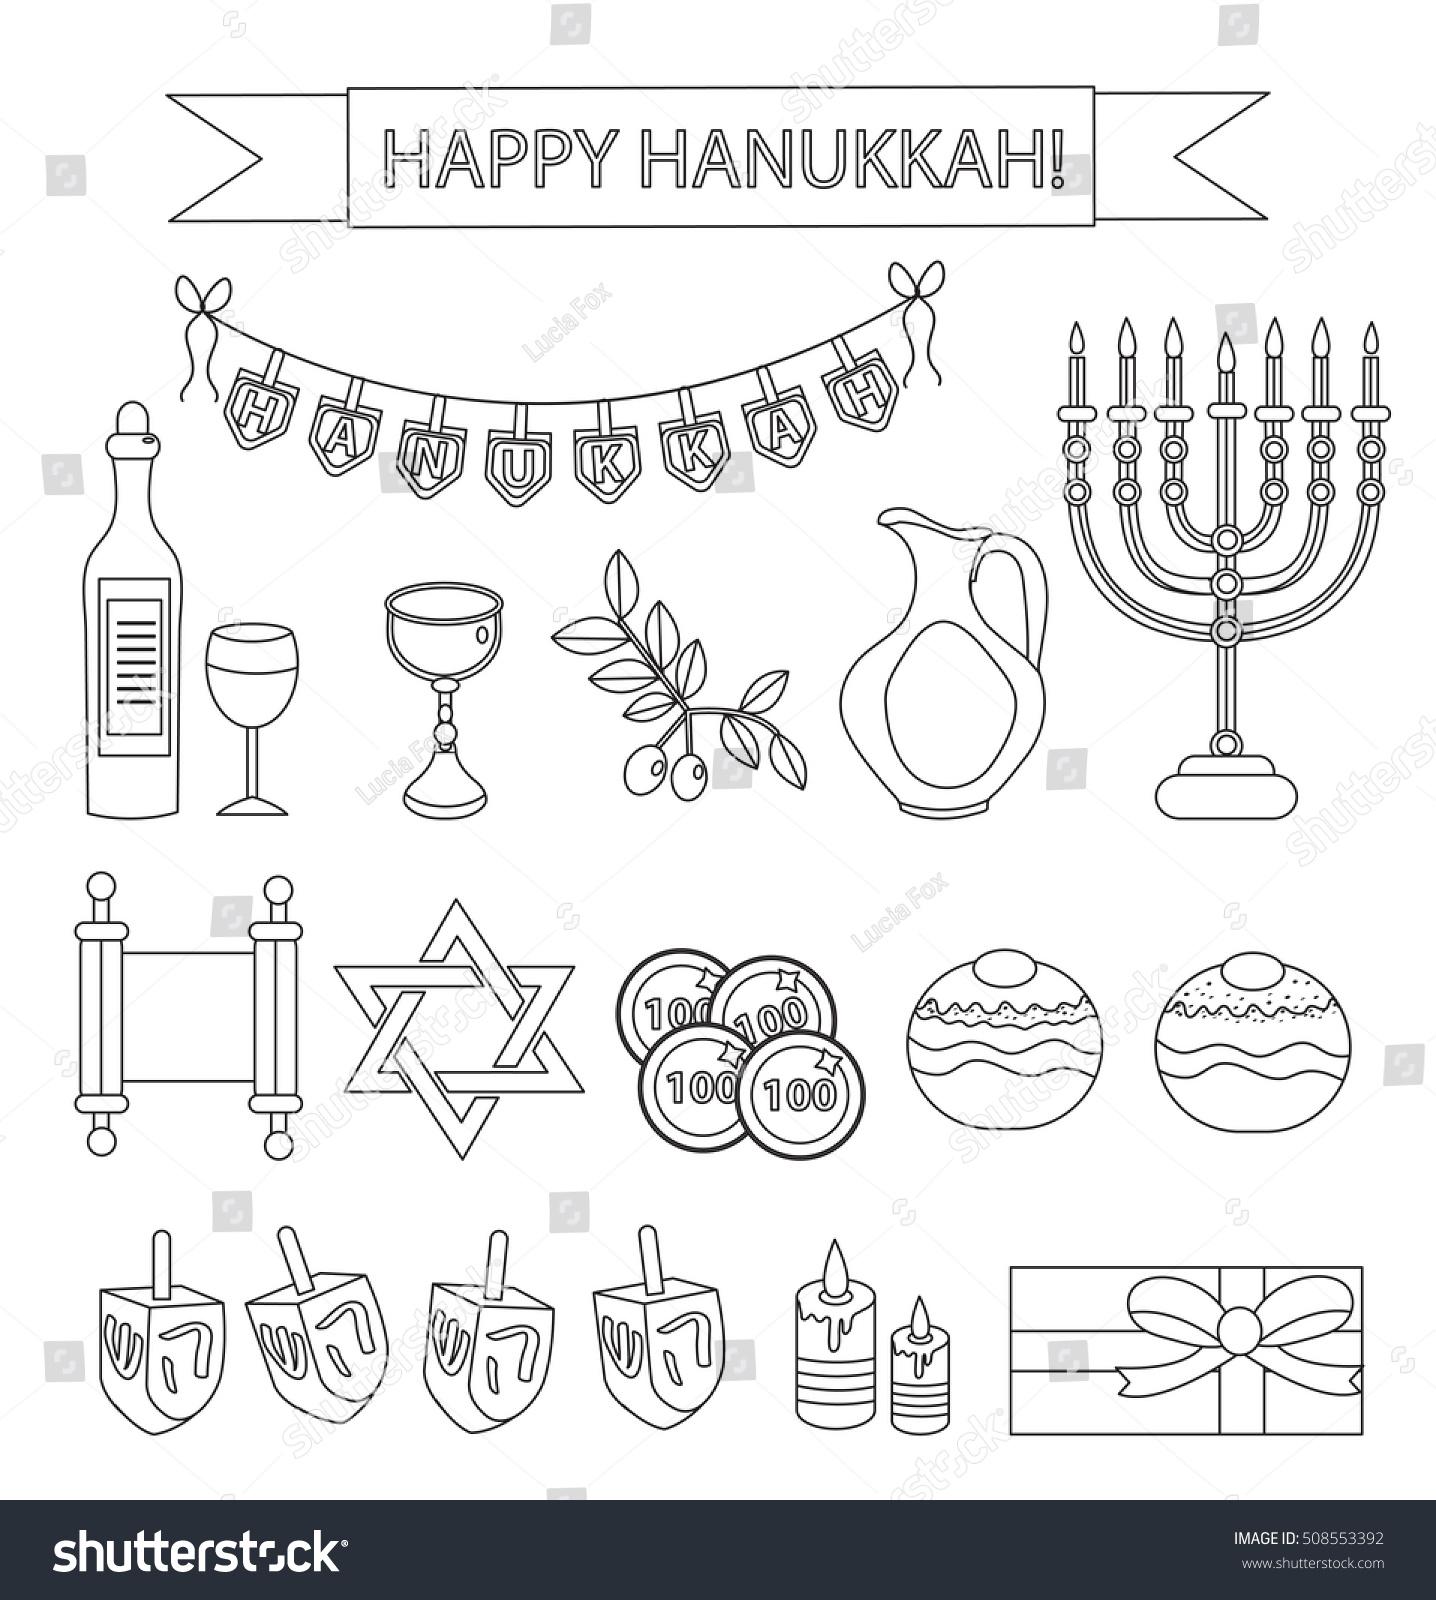 Hanukkah set menorah torah sufganiyot olives stock vector hanukkah set with menorah torah sufganiyot olives and dreidel happy hanukkah festival biocorpaavc